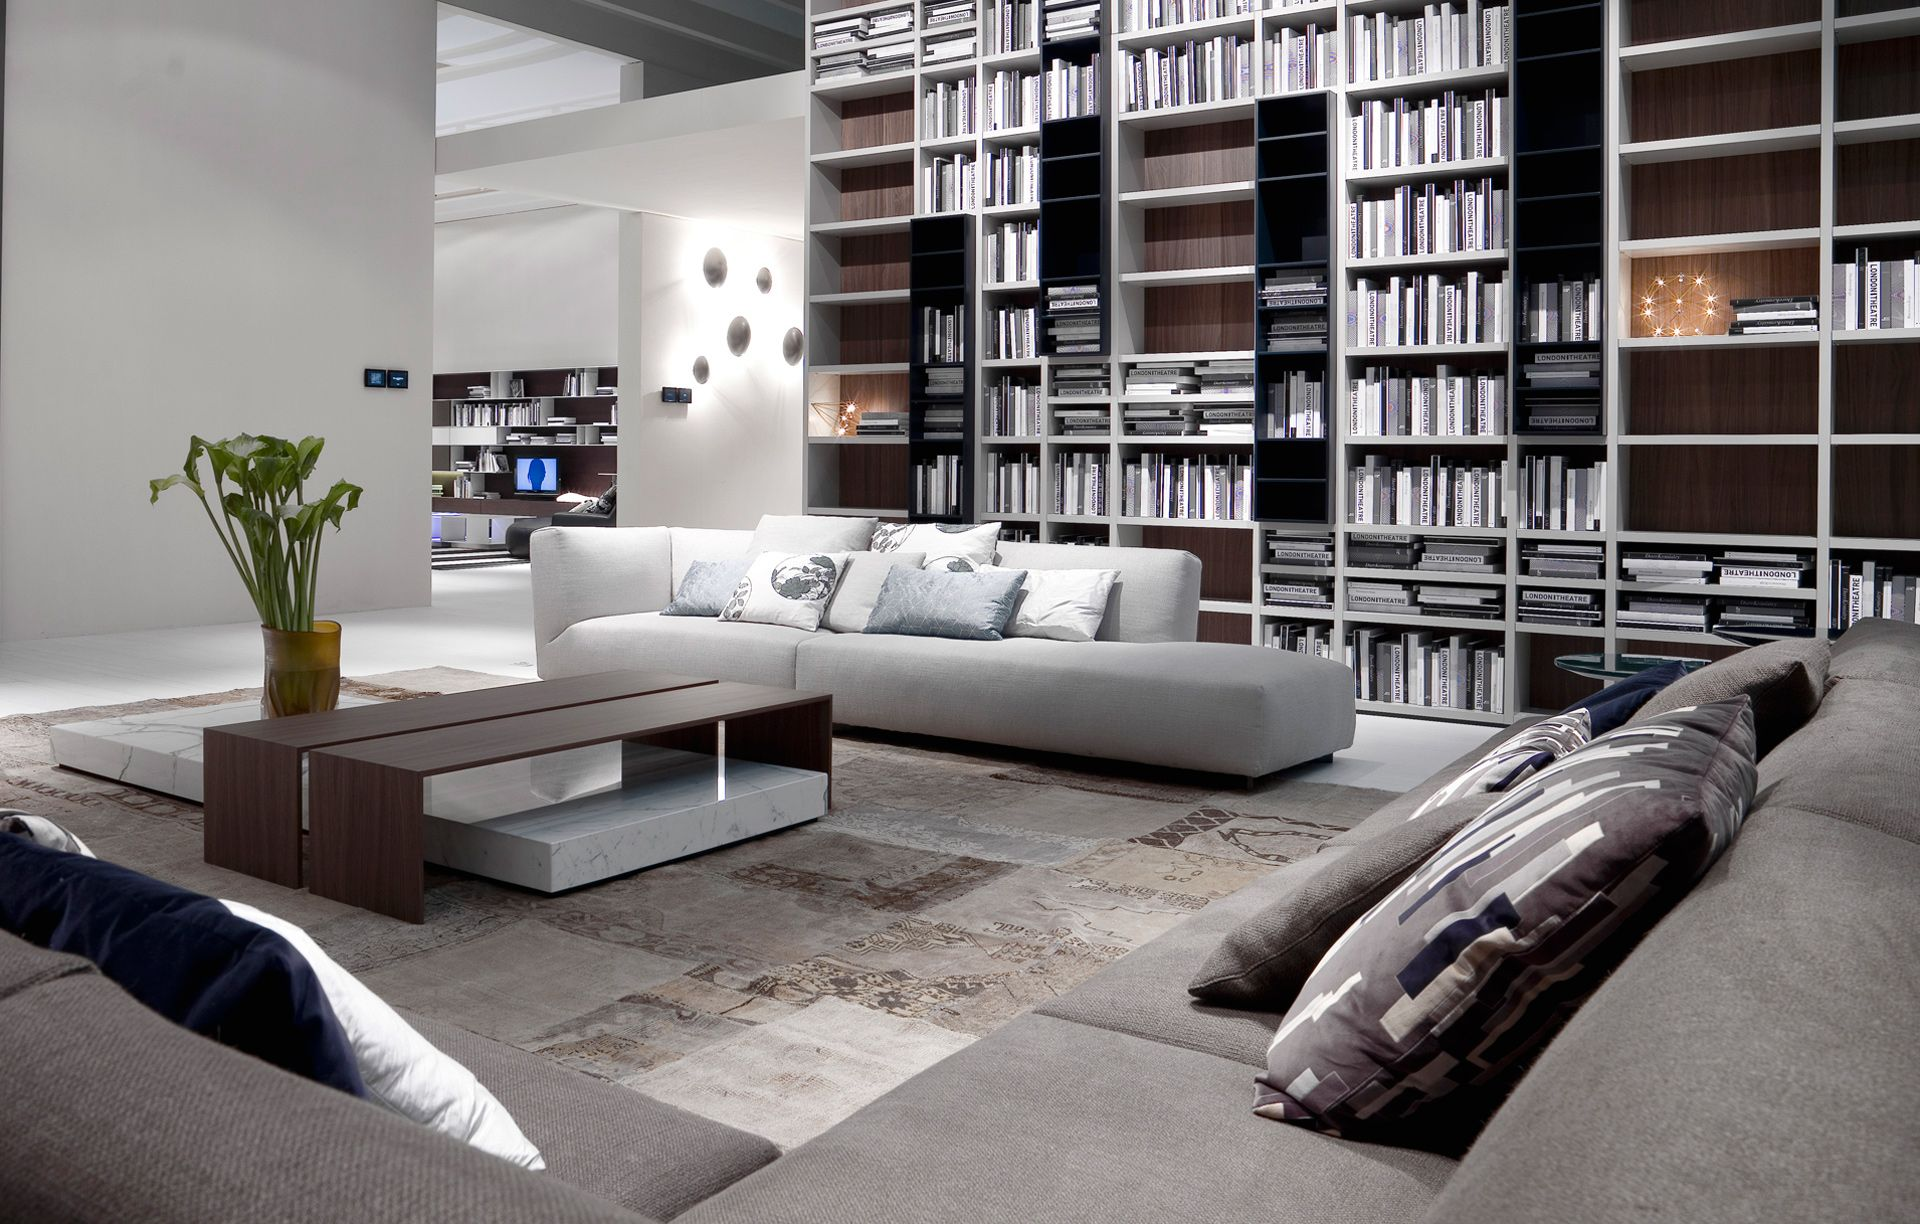 Poliform - Wall System   Product: Wall   Pinterest   Modular sofa ...